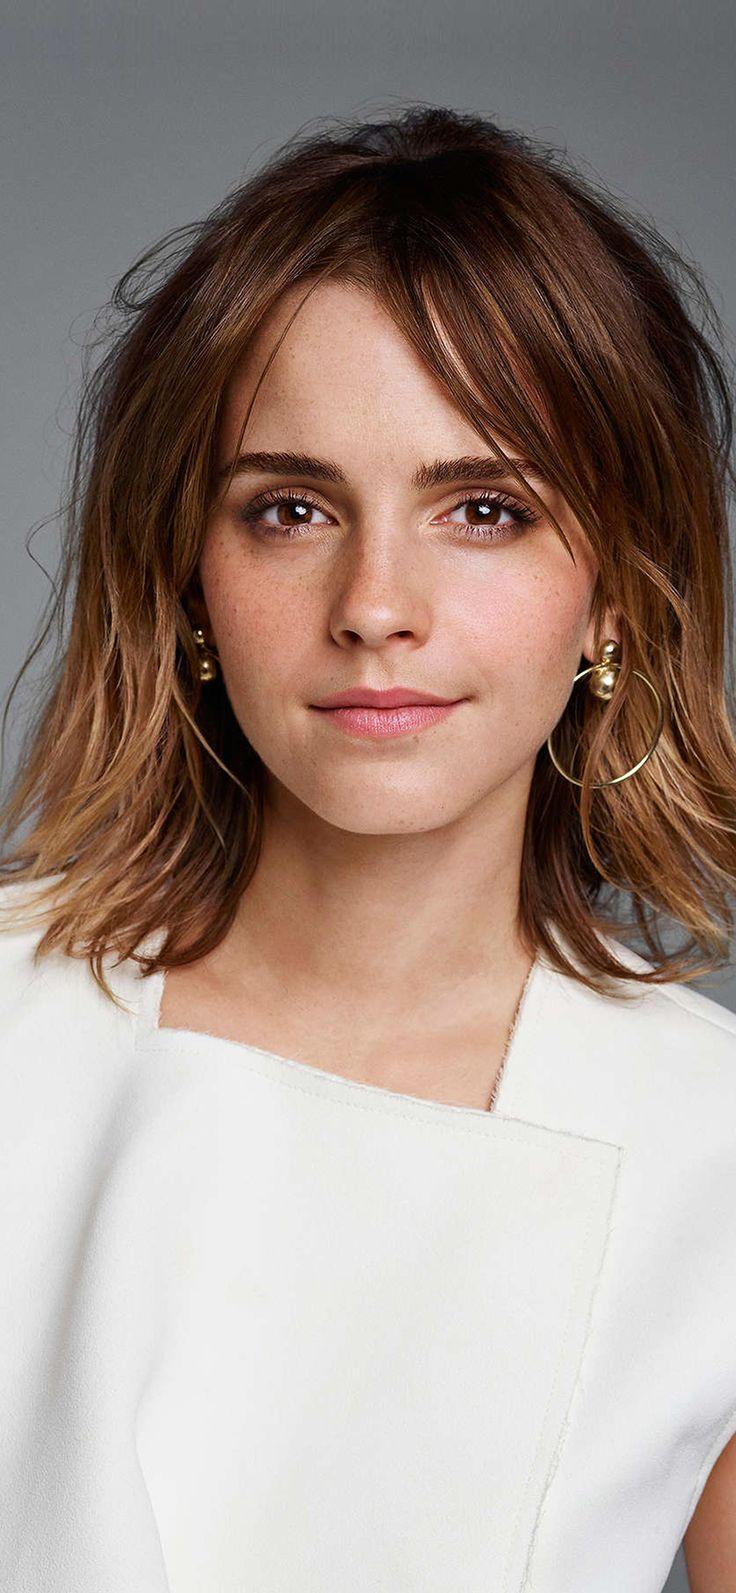 WallpaperMISC Emma Watson HD Wallpaper  X Free TOP